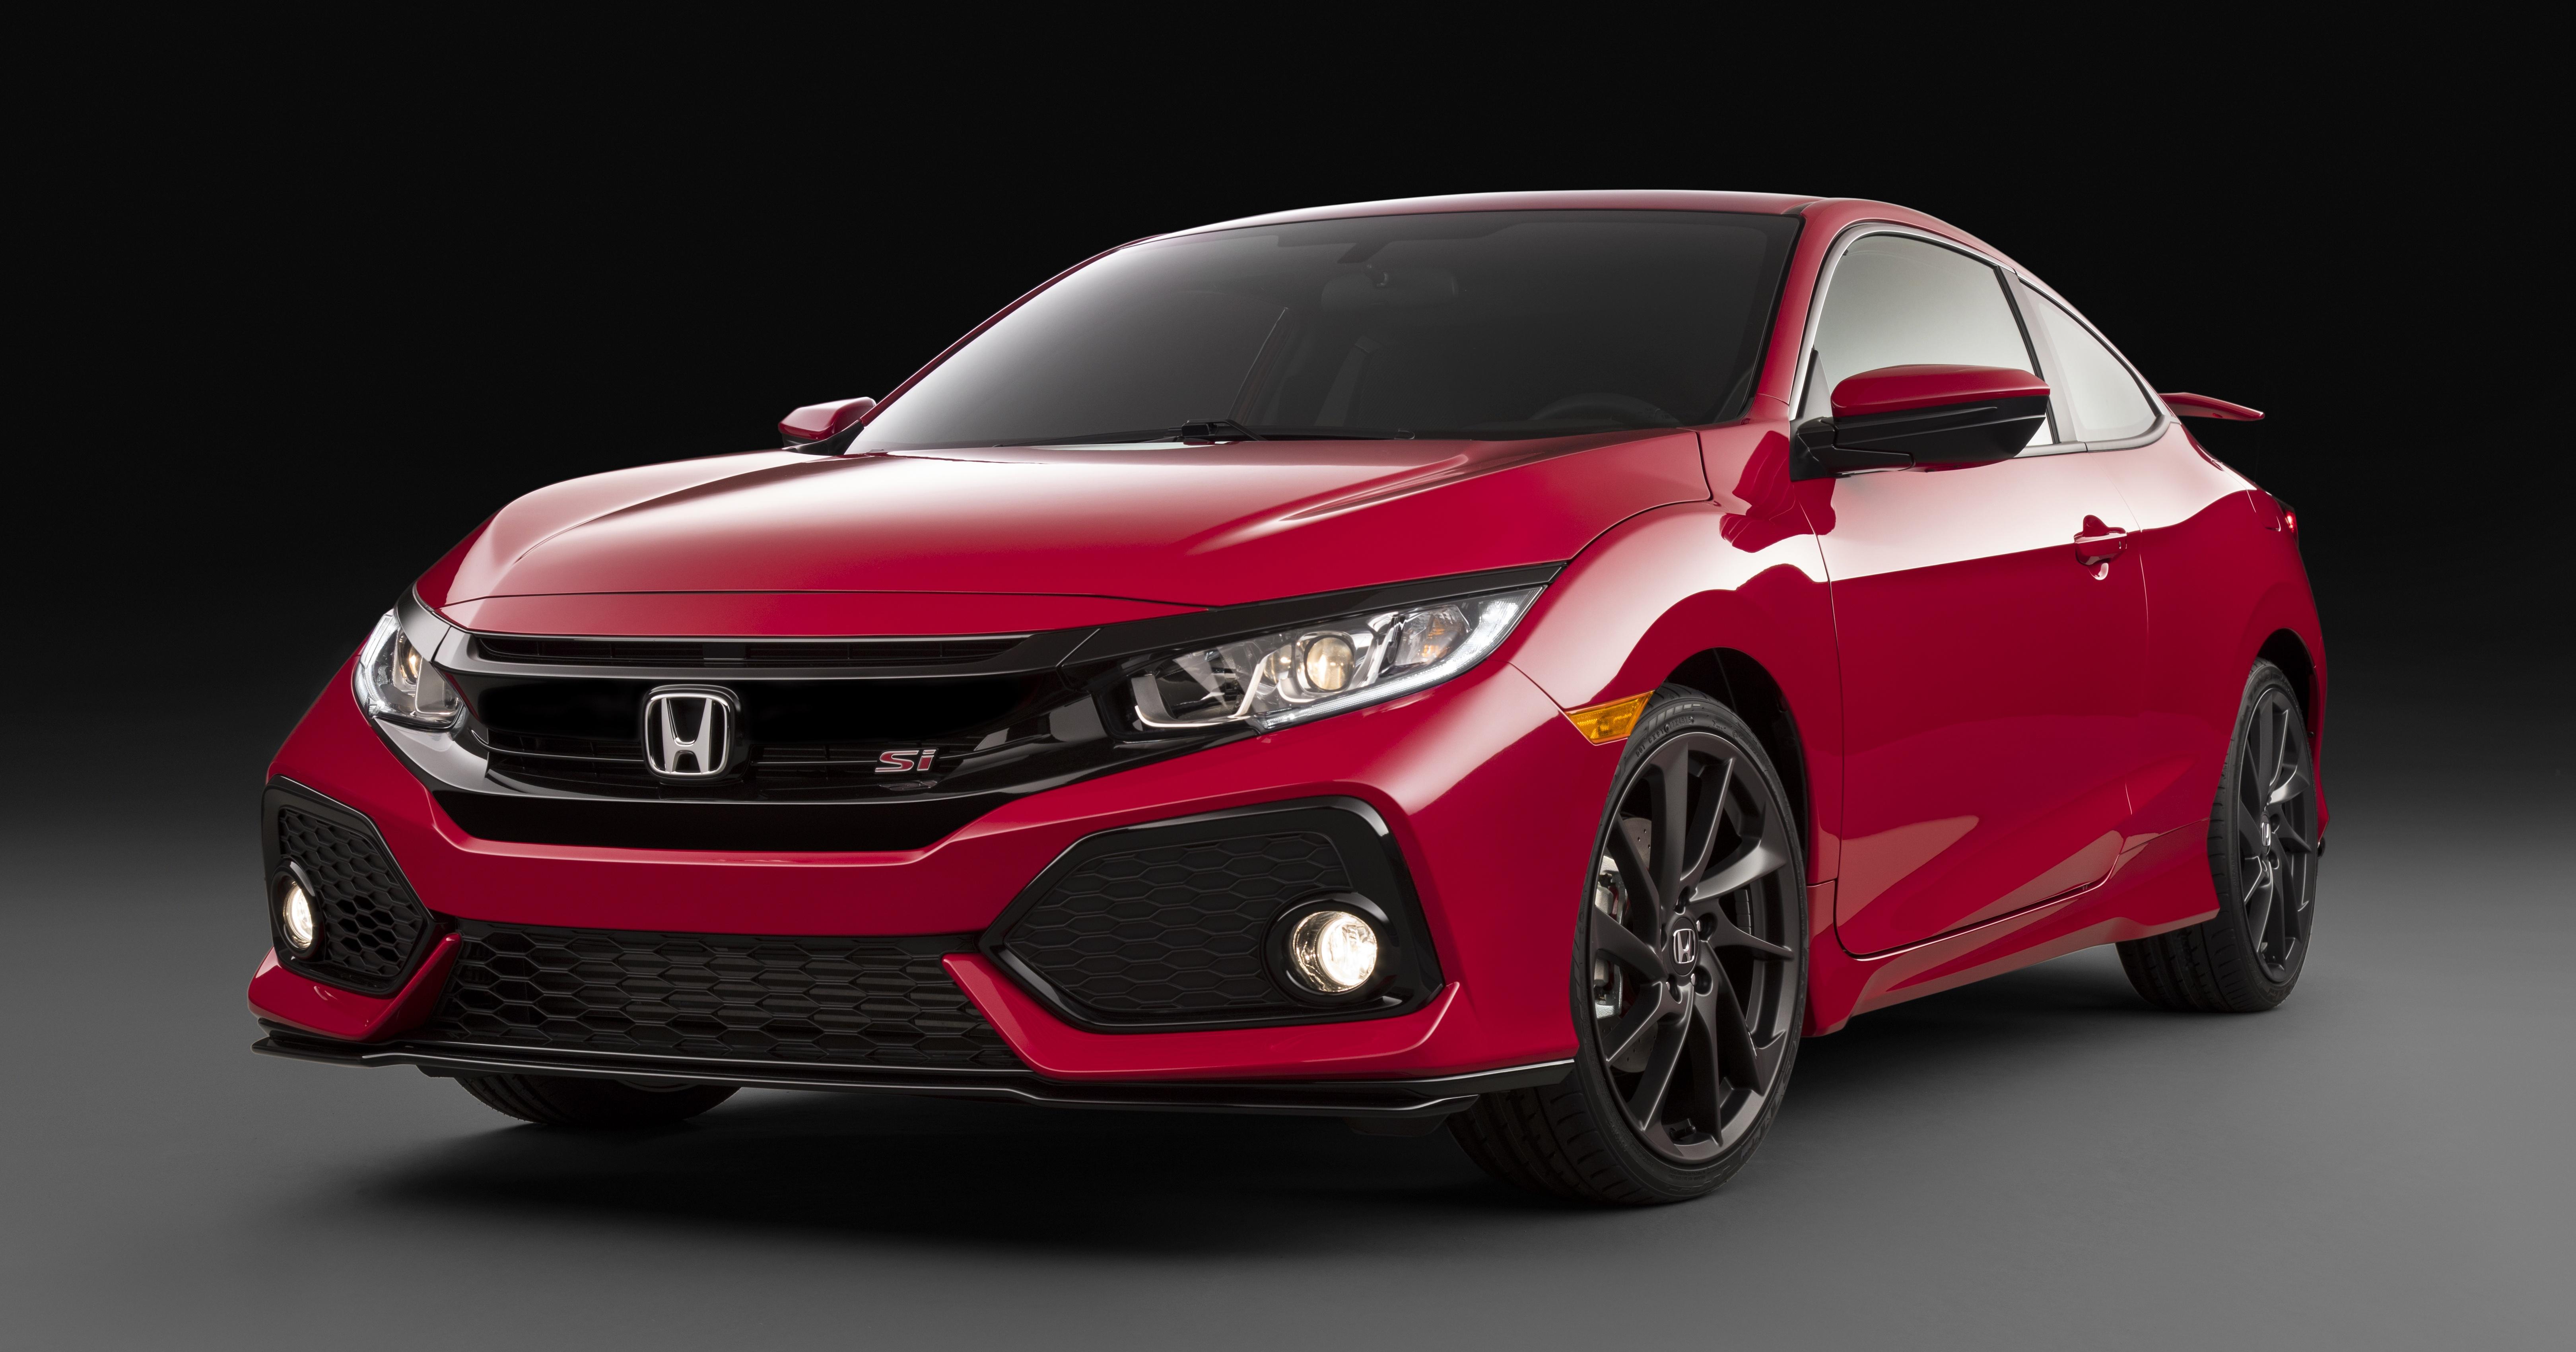 Honda Civic Si Prototype Revealed For LA Auto Show